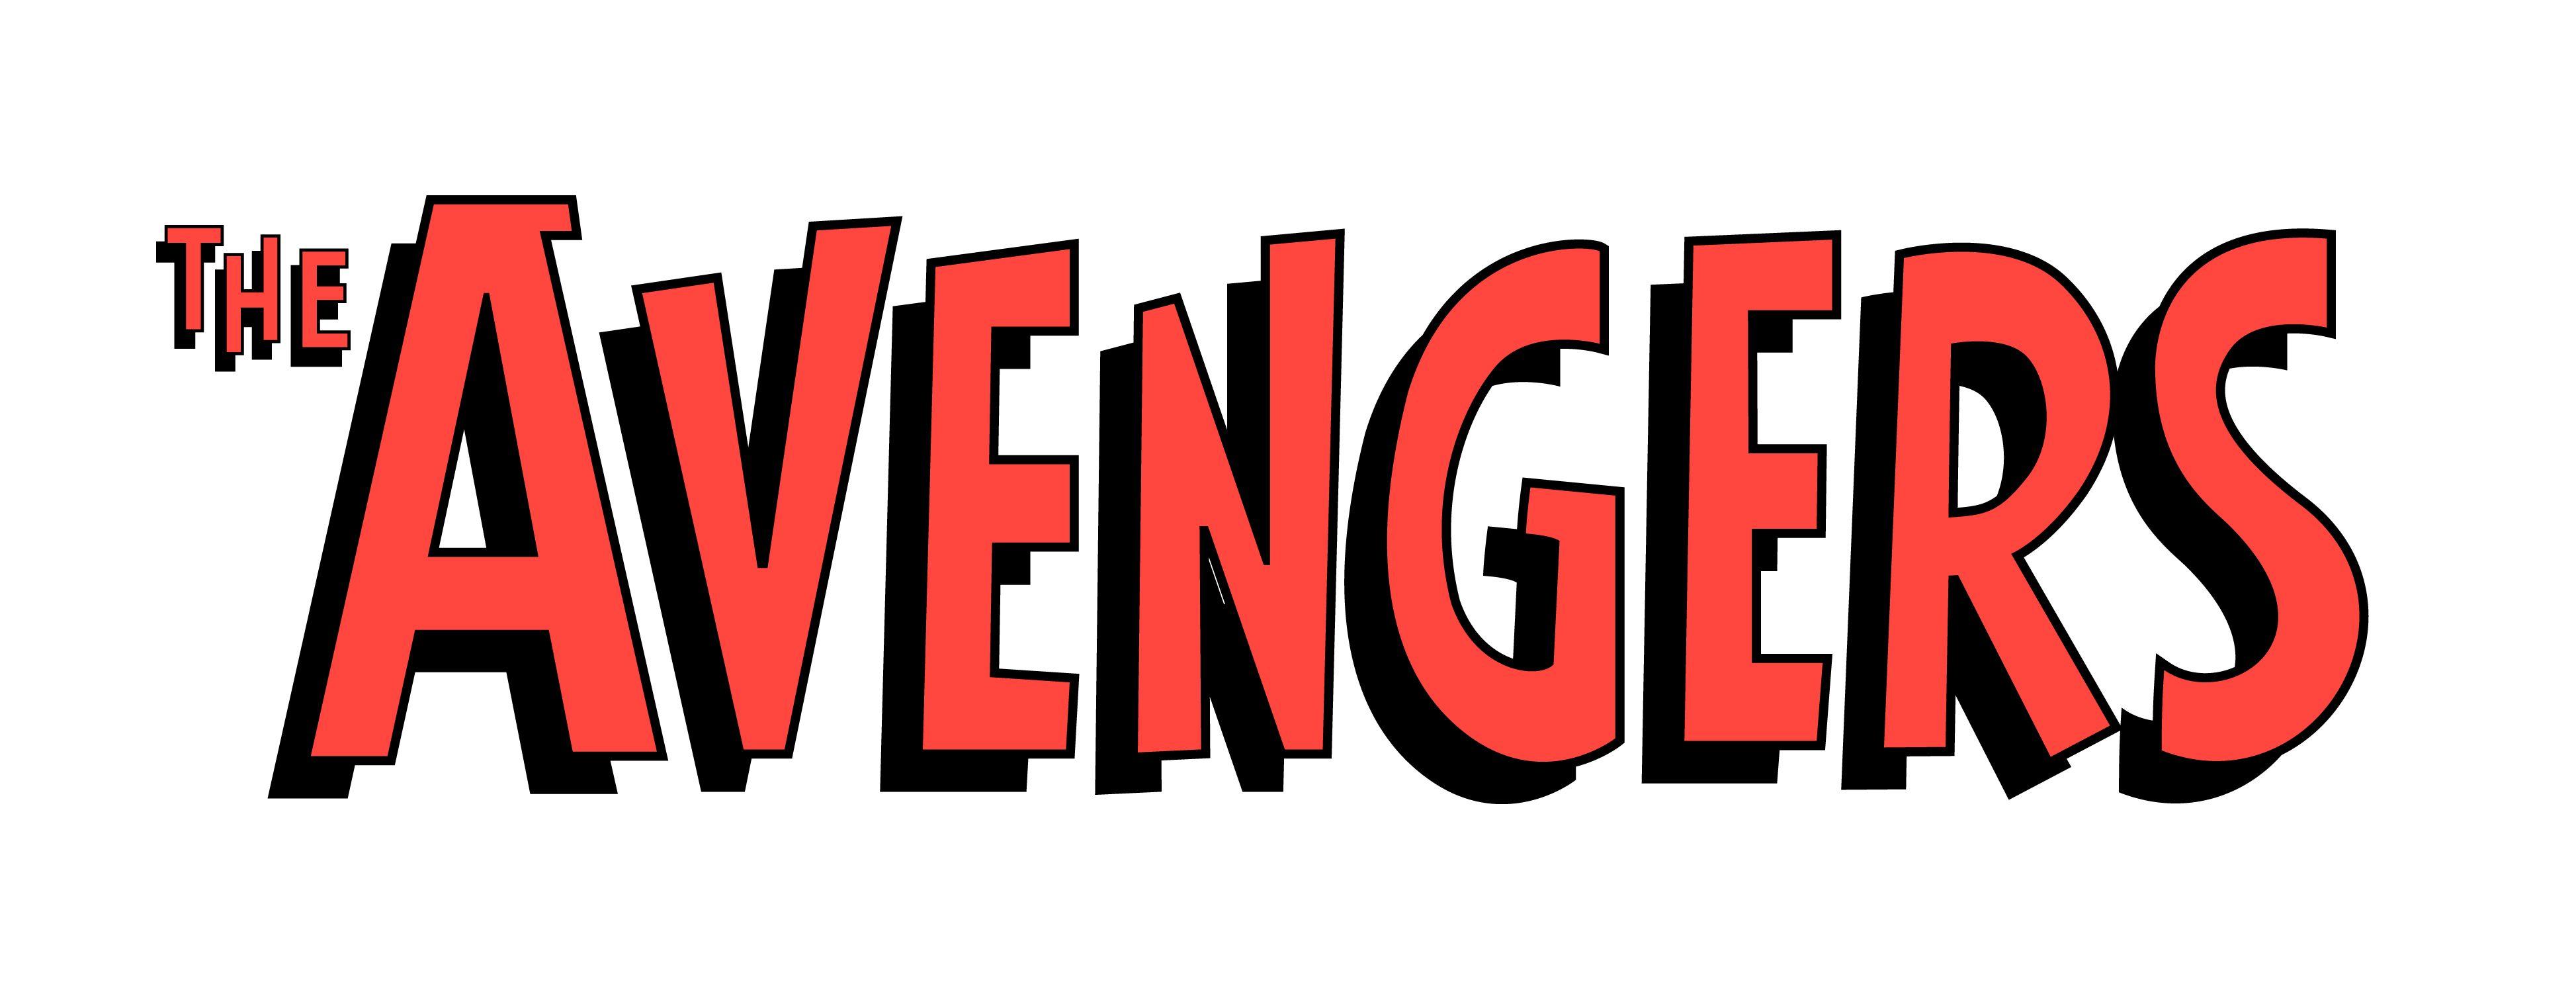 classic avengers logo Comic illustration, Marvel comics